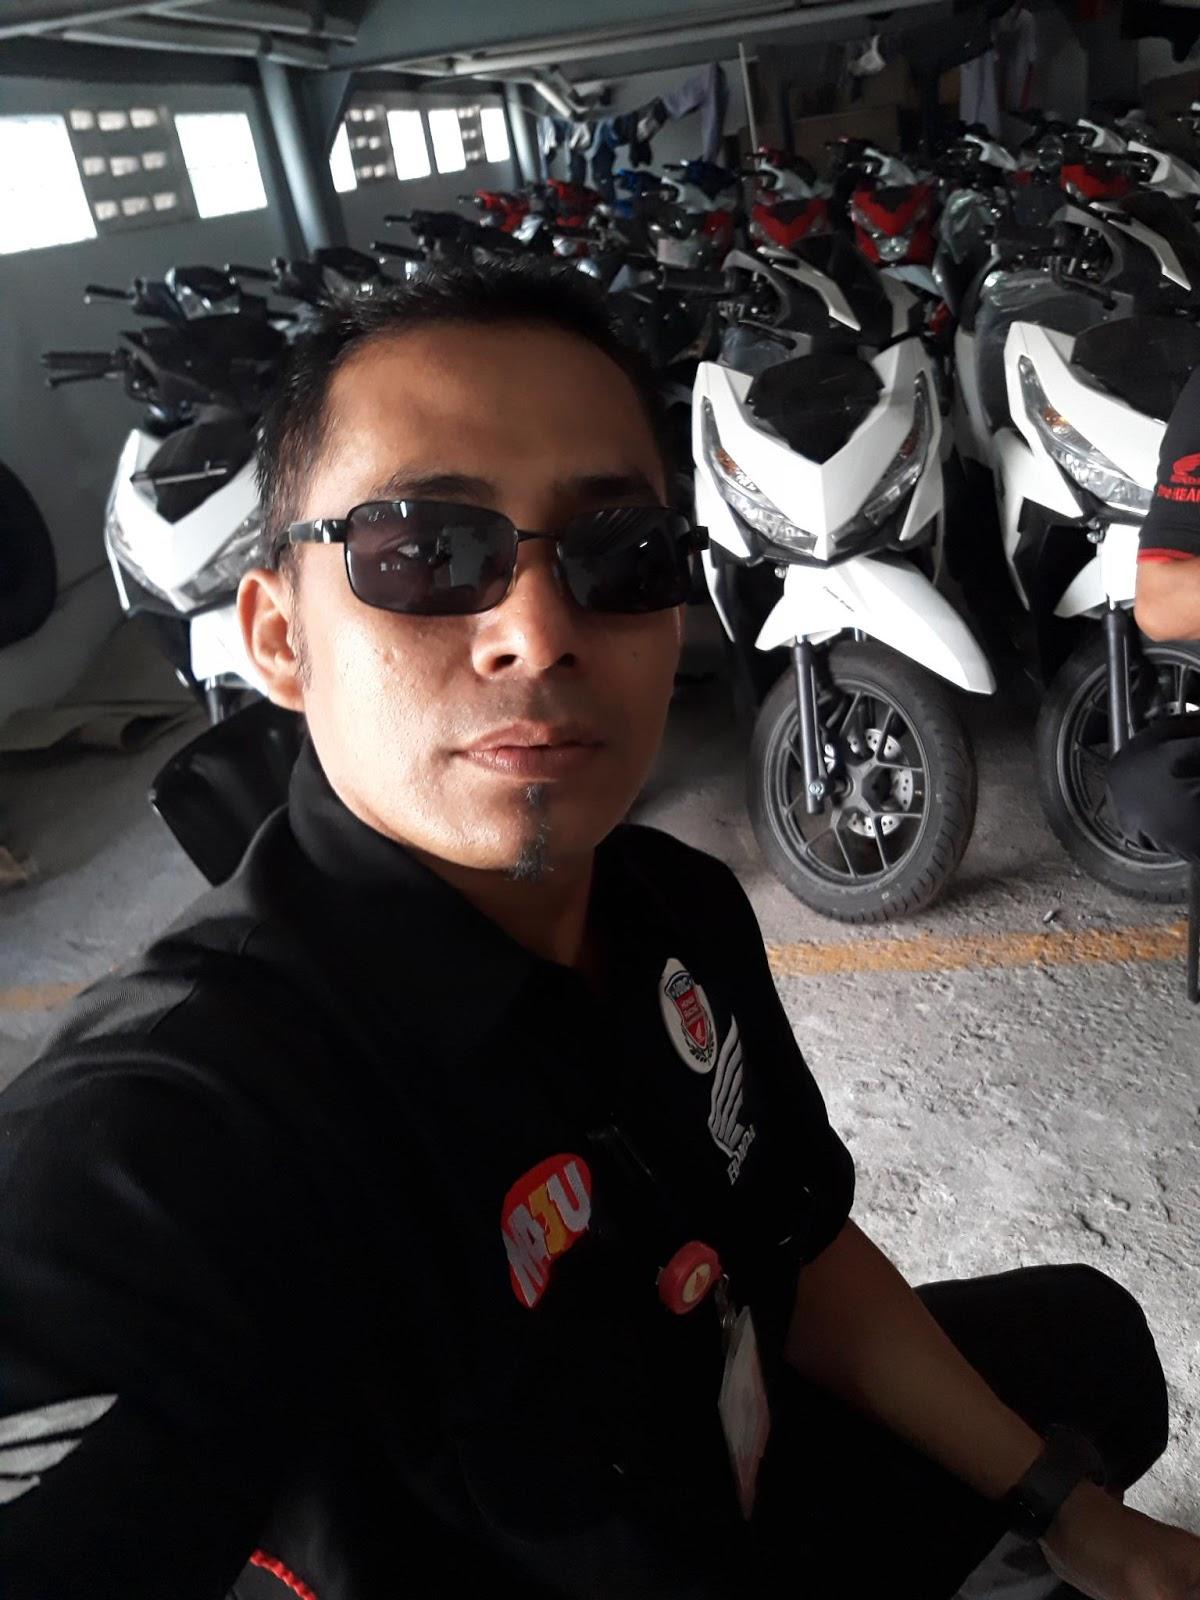 Trisno Honda Maju Ungaran New Vario 110 Esp Cbs Iss Grande White Kab Semarang Jumat 09 Februari 2018